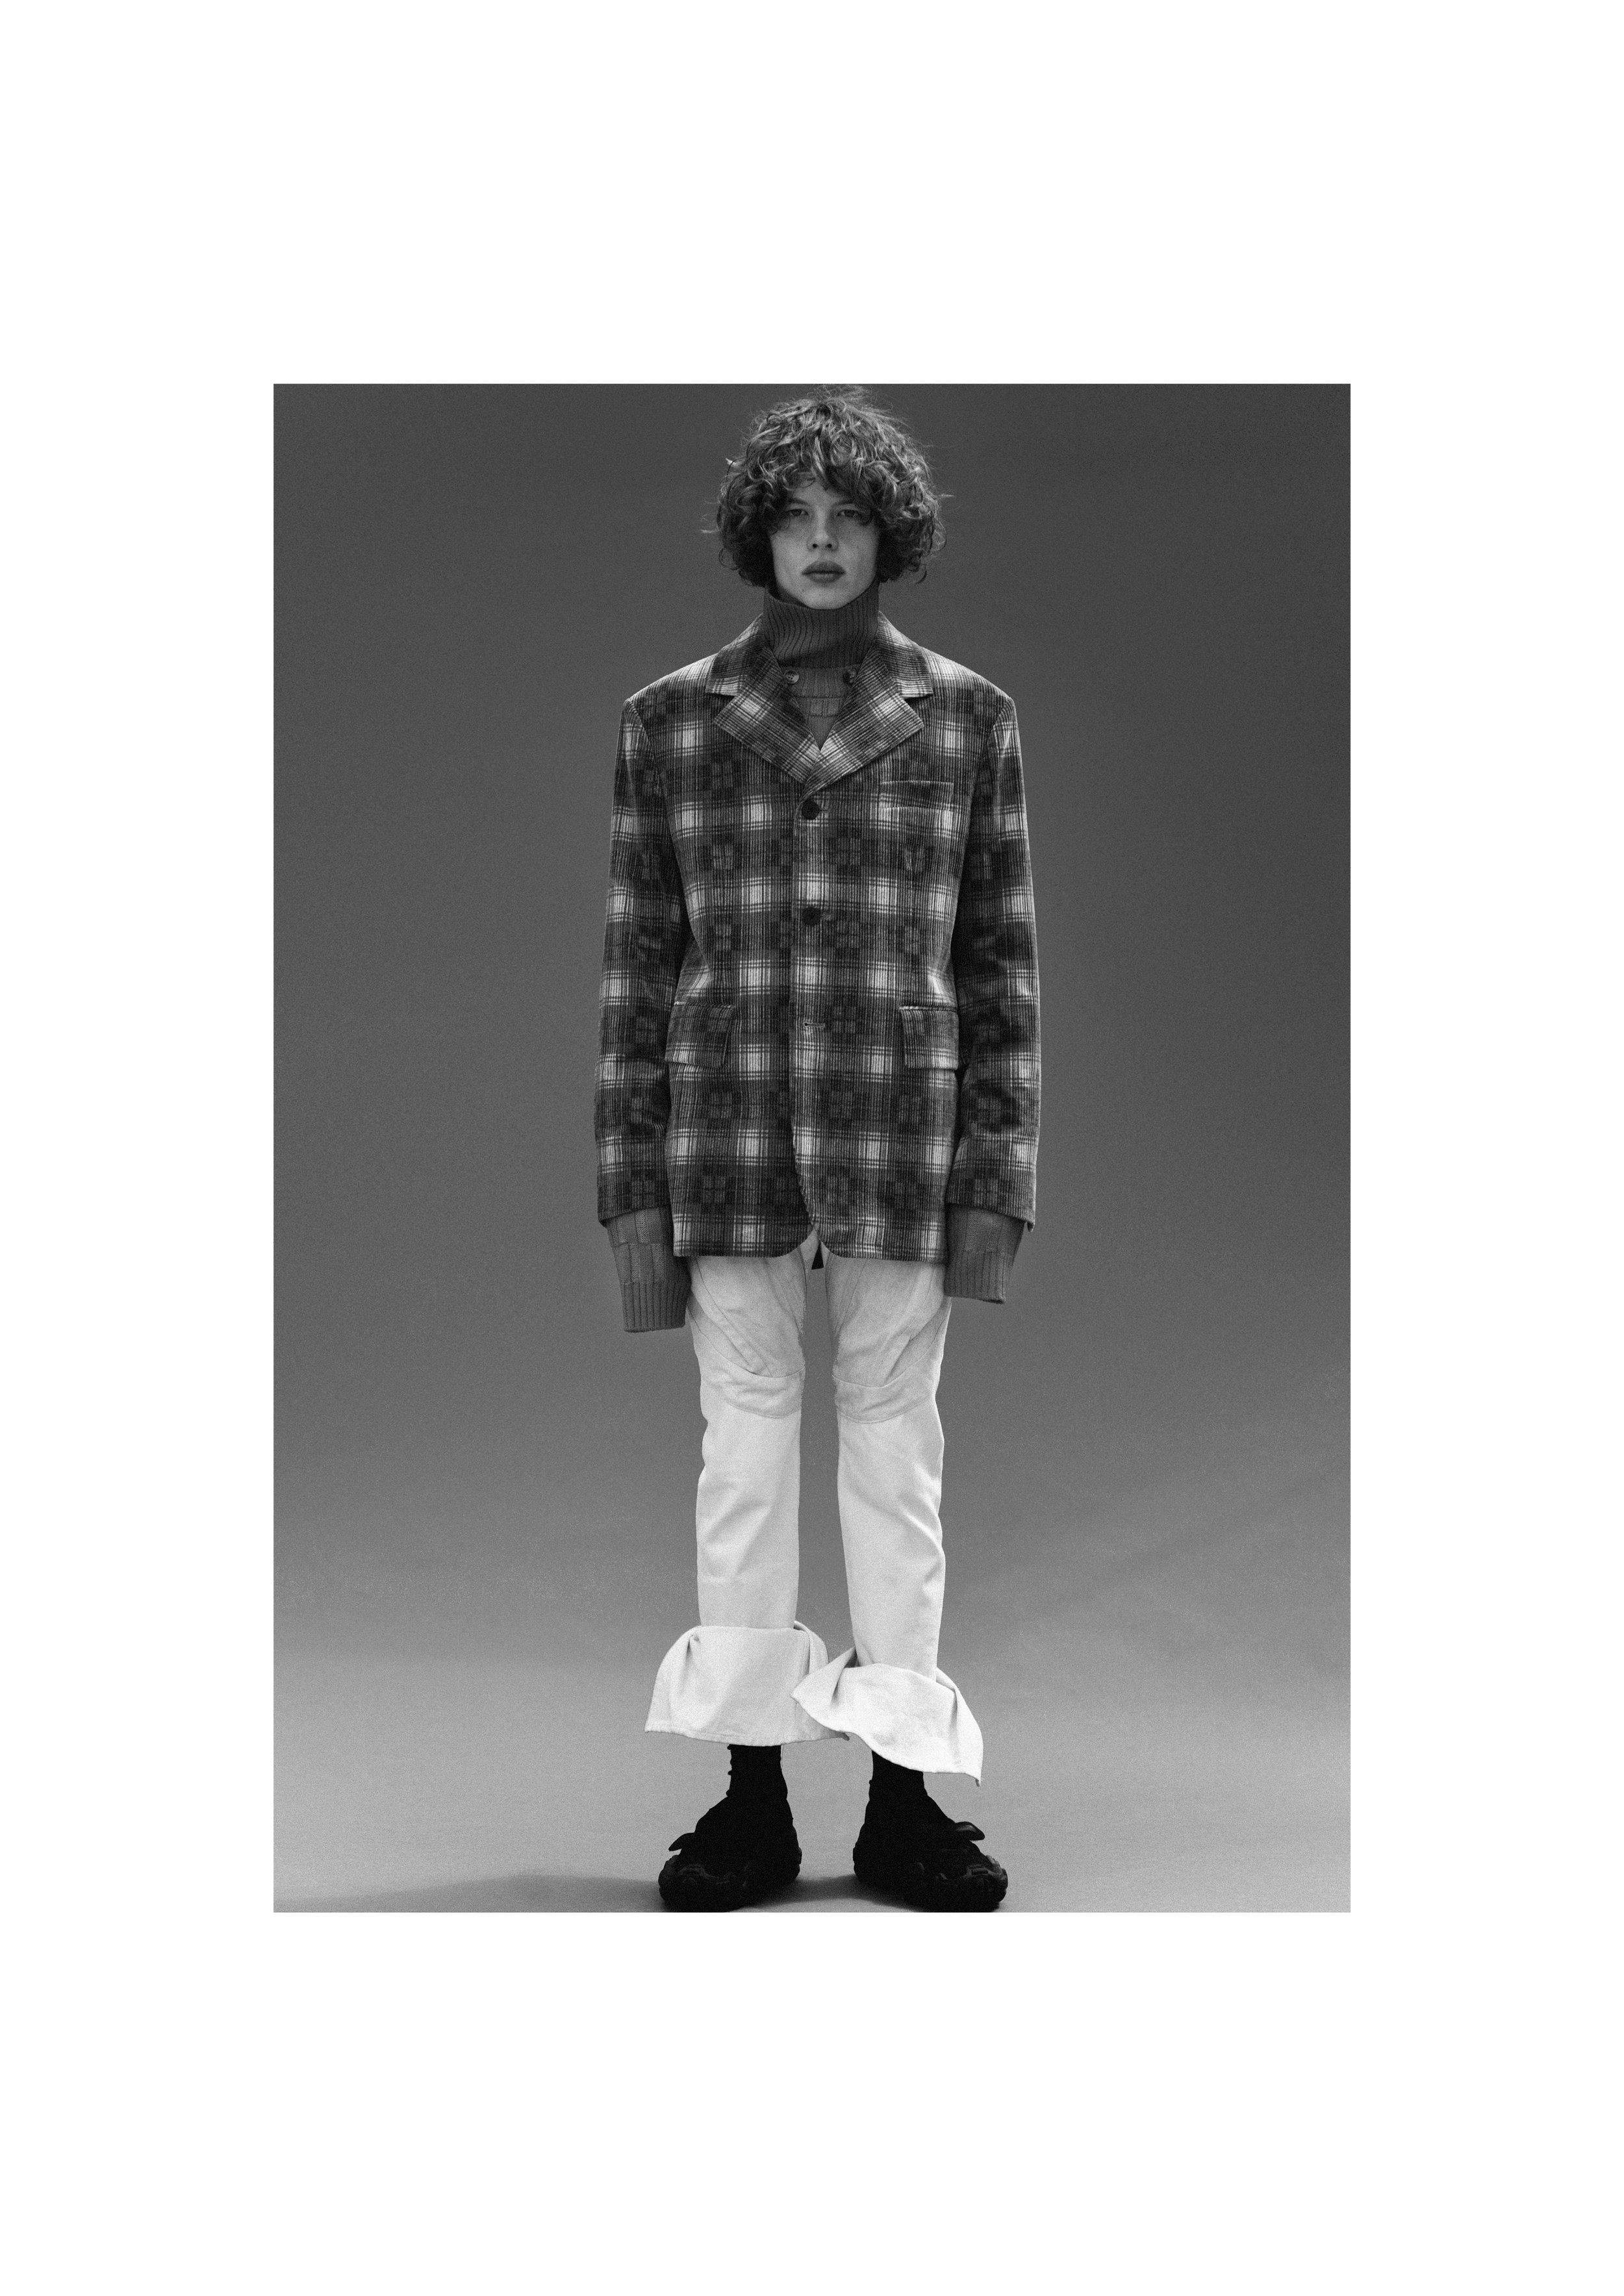 Jacket - Wooyoungmi Jumper - Alex Mullins Jeans - Per Götesson Shoes - Acne Studios